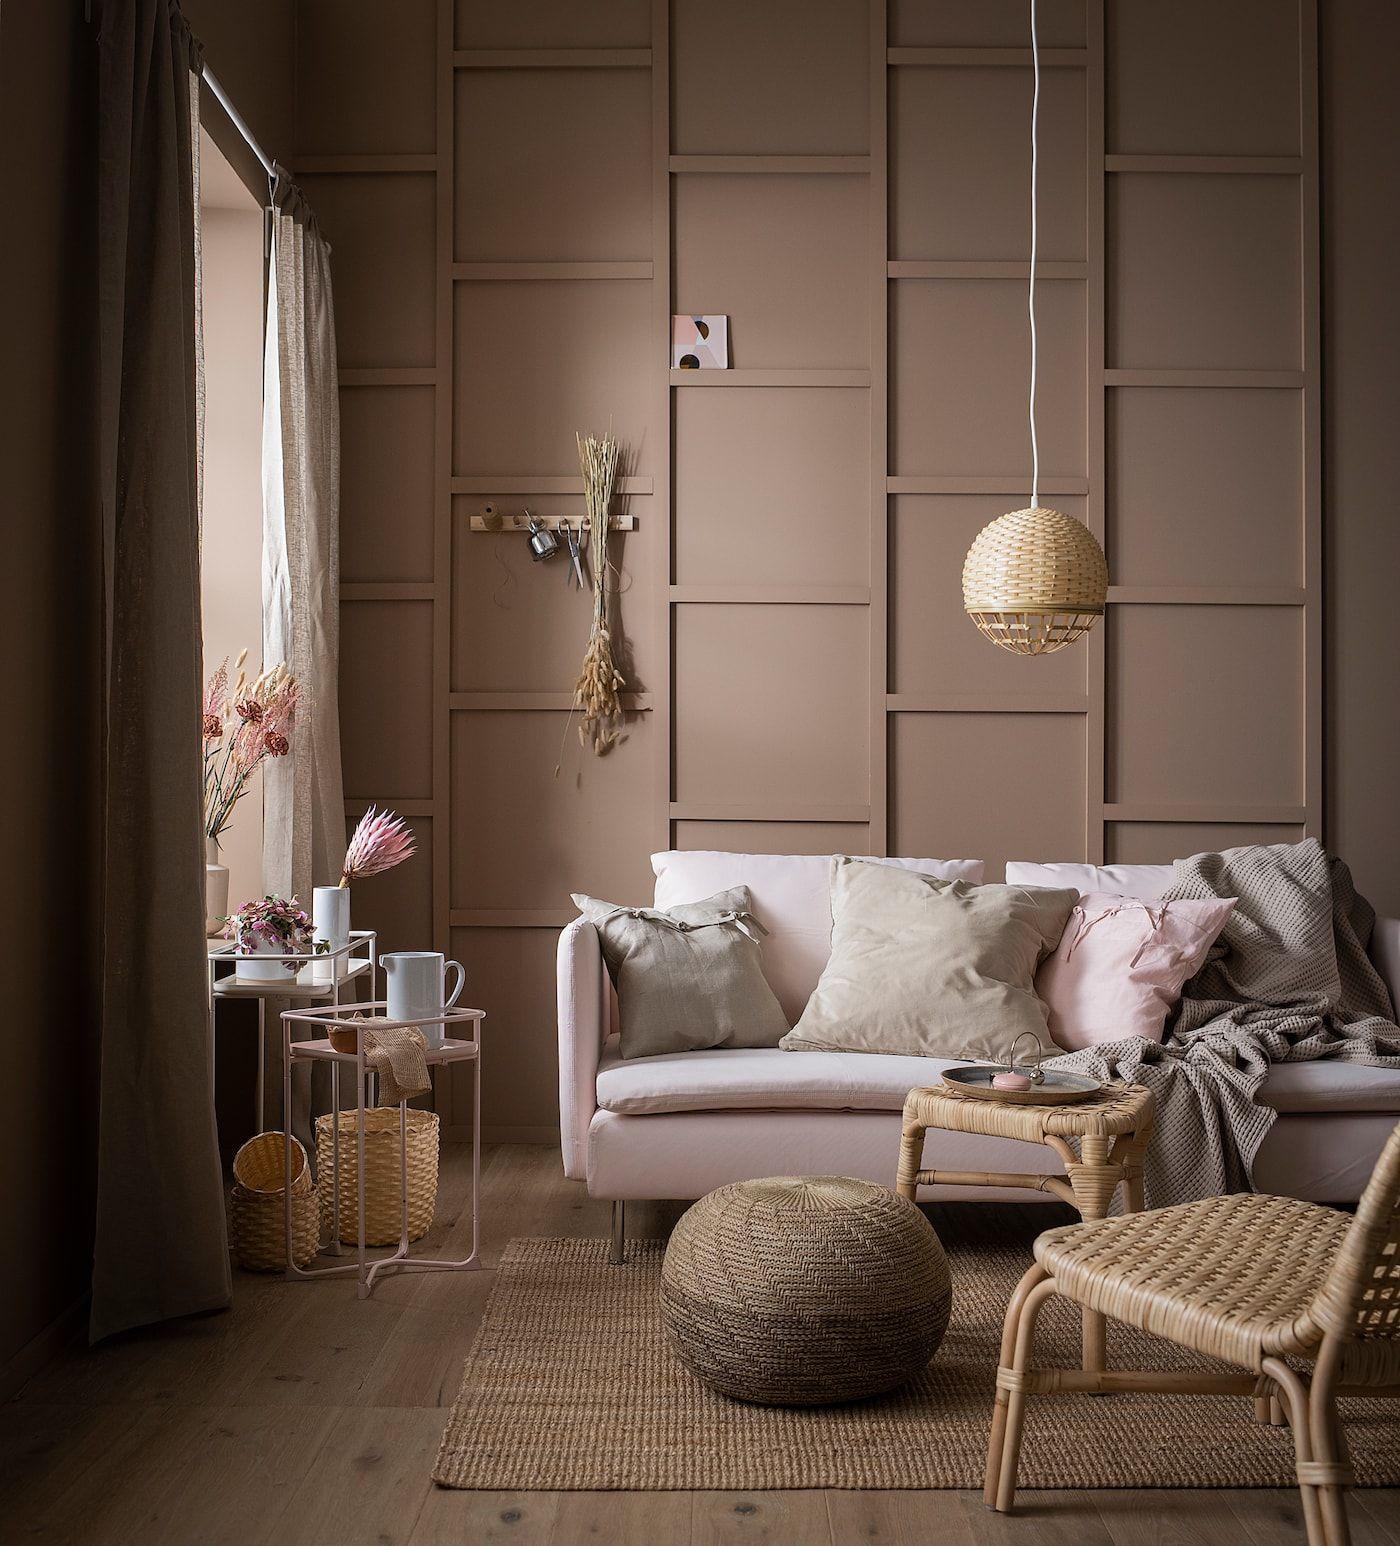 Kryddpeppar Floreira Interior Exterior Bege Ikea Plant Stand Indoor Bamboo In Pots Living Room Plants